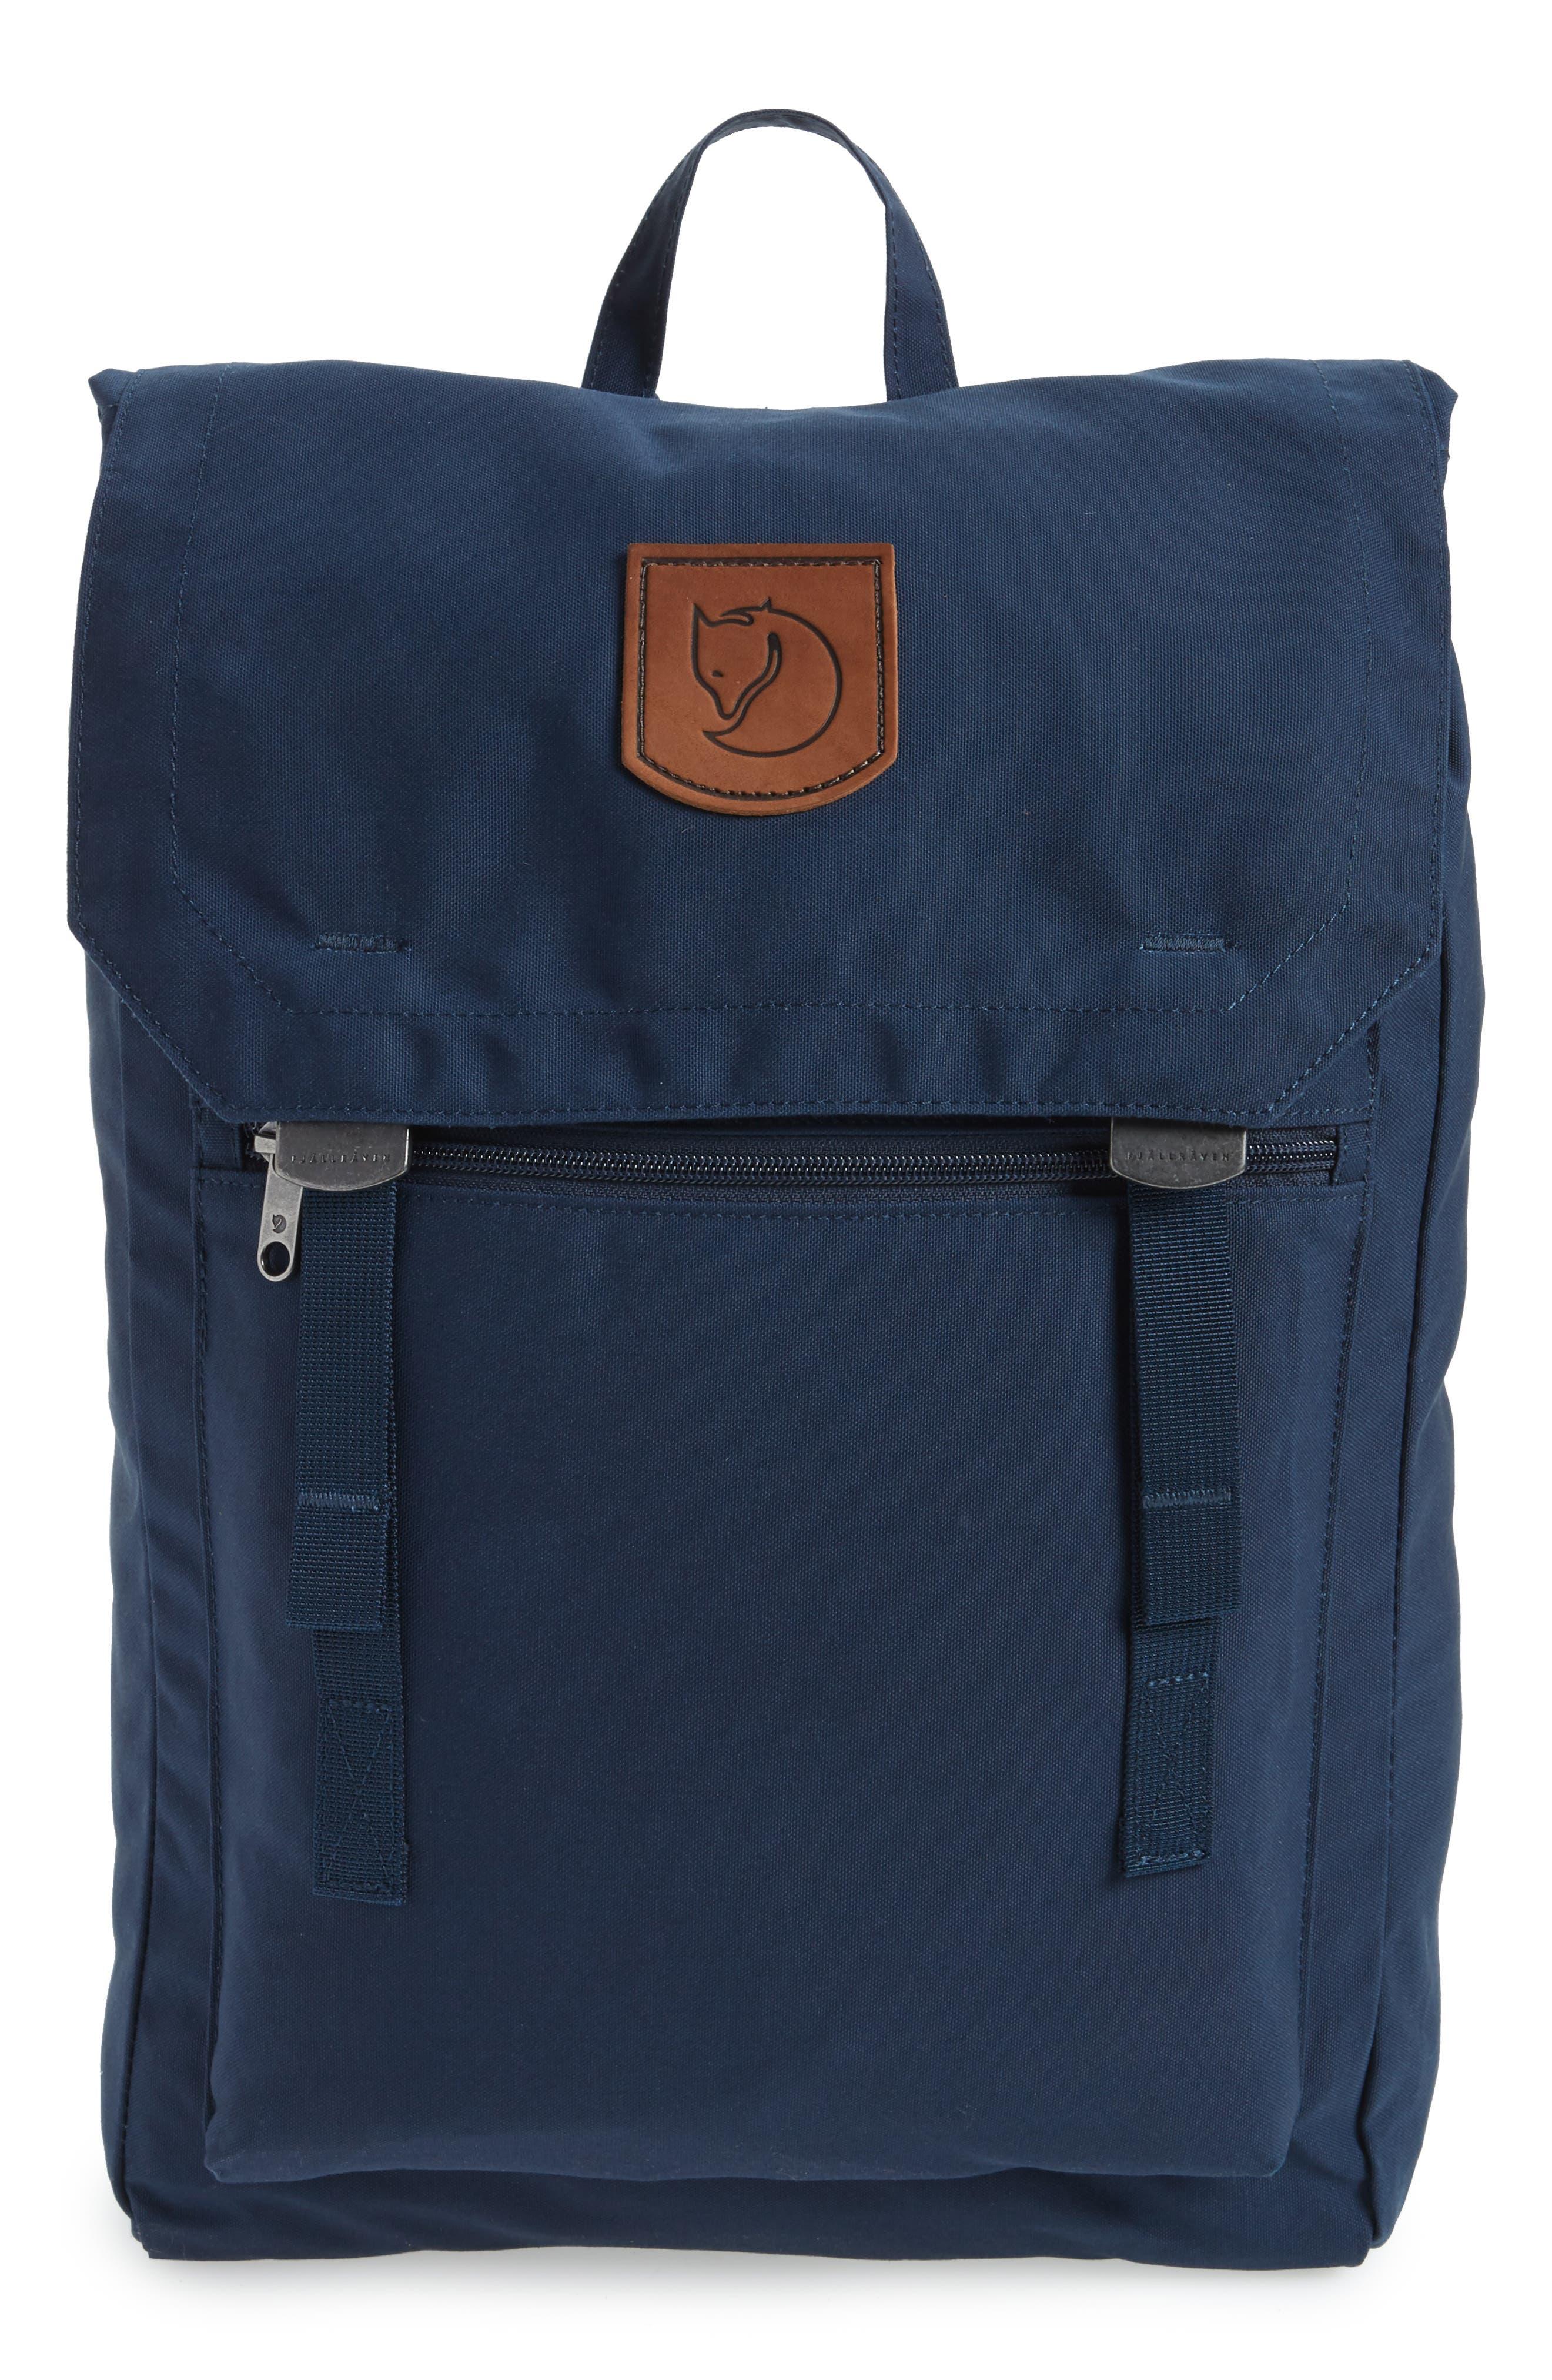 Foldsack No.1 Water Resistant Backpack,                             Main thumbnail 1, color,                             Navy